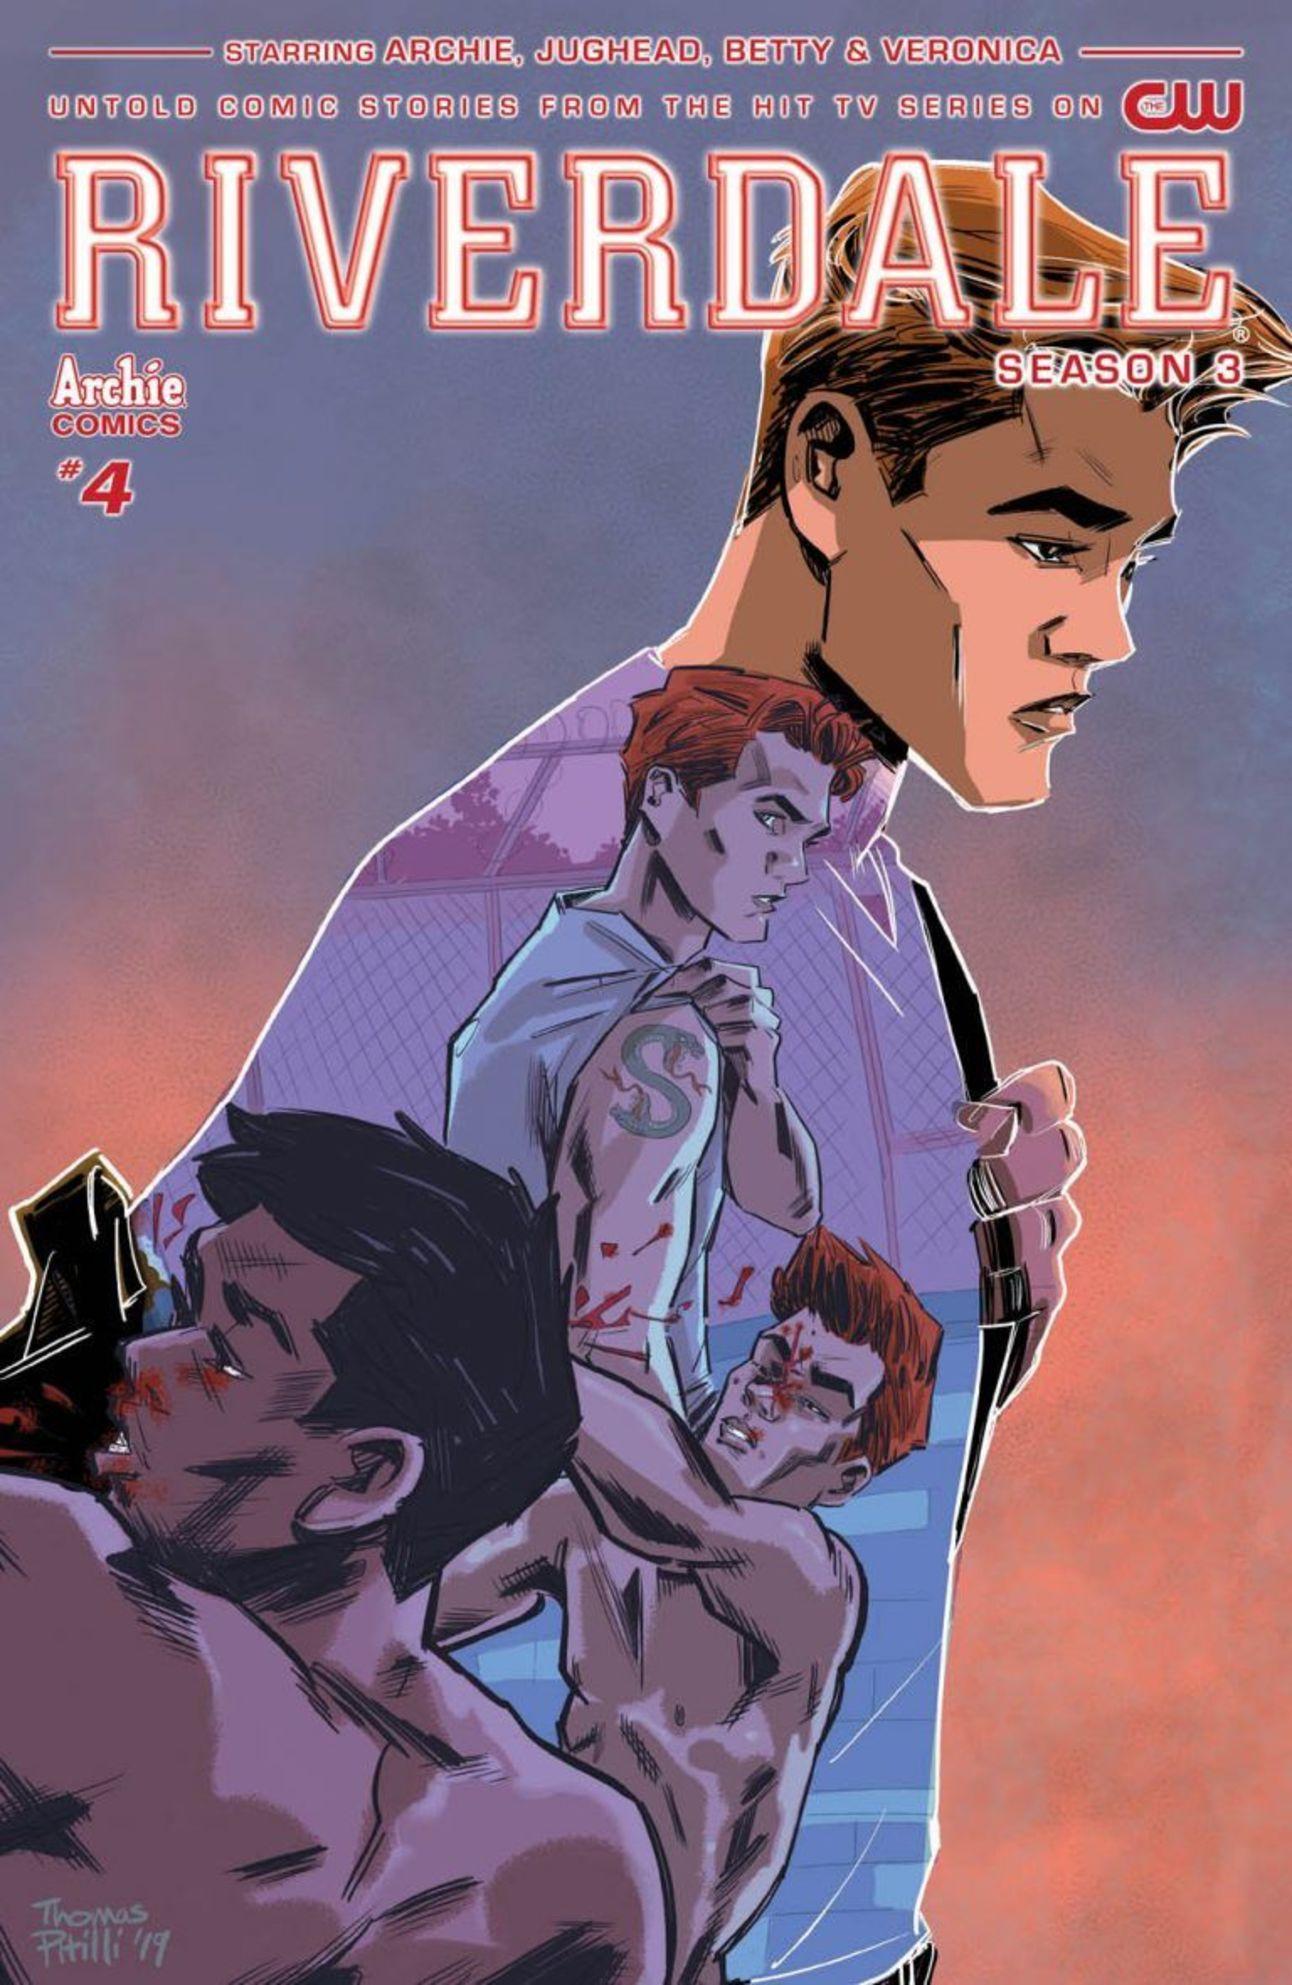 Archie June 2019 5